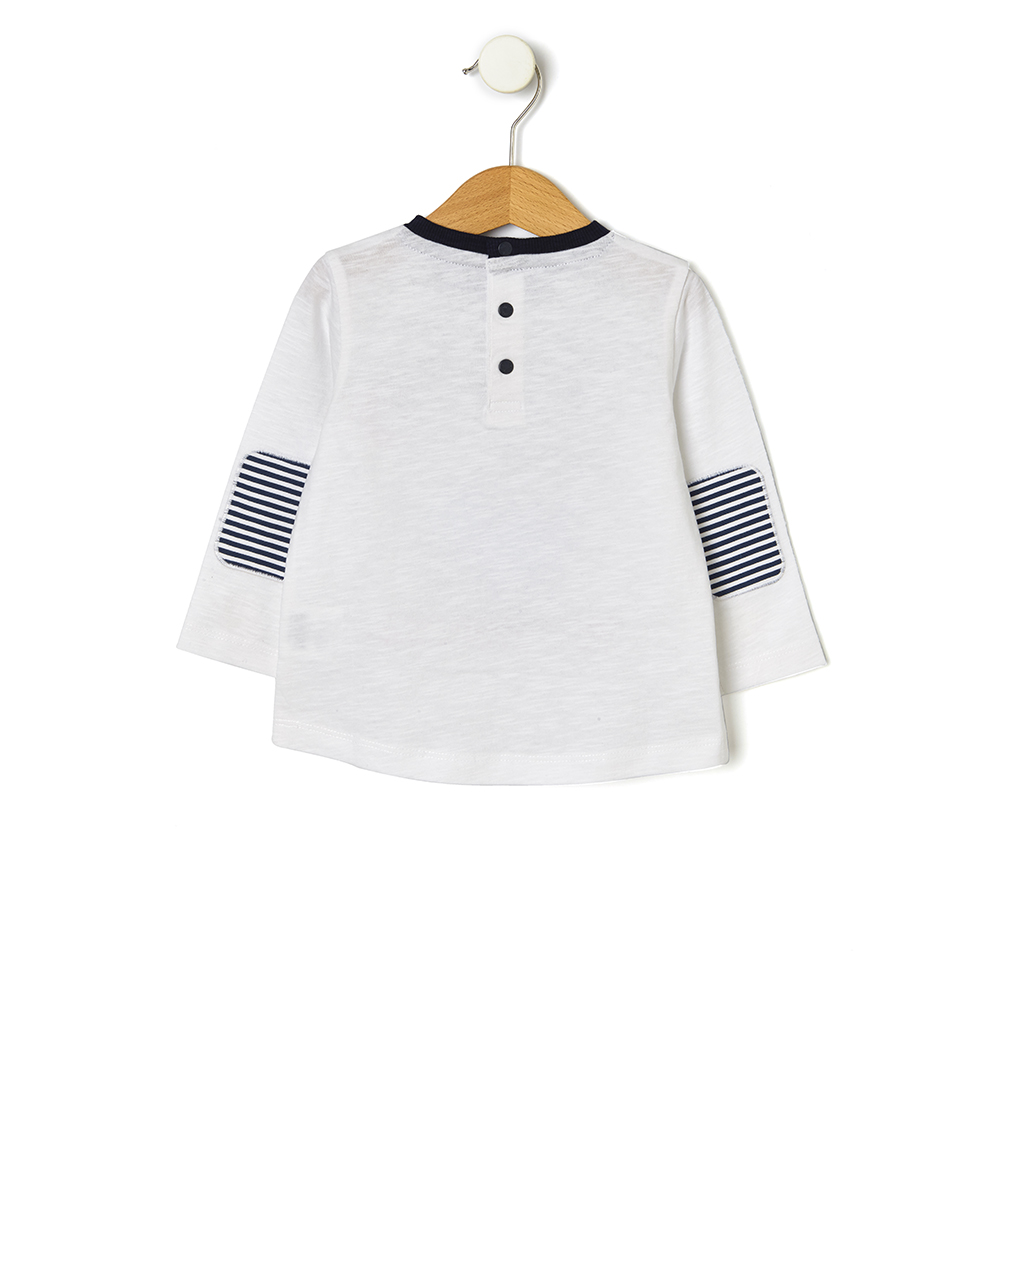 T-shirt stampa marinara - Prénatal